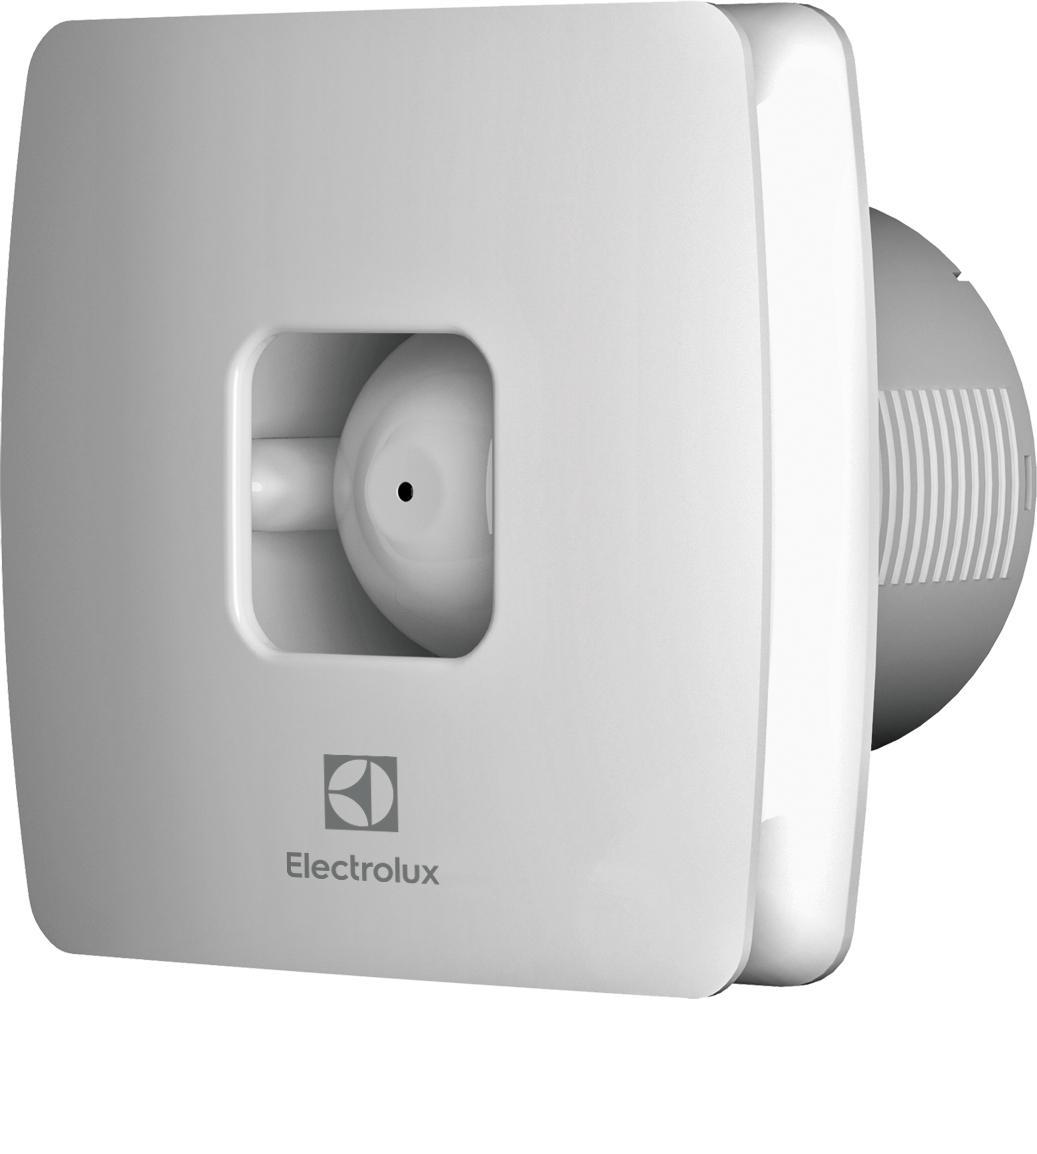 Вентилятор Electrolux Premium eaf-120 сменная панель e rp 120 steel для вентилятора electrolux